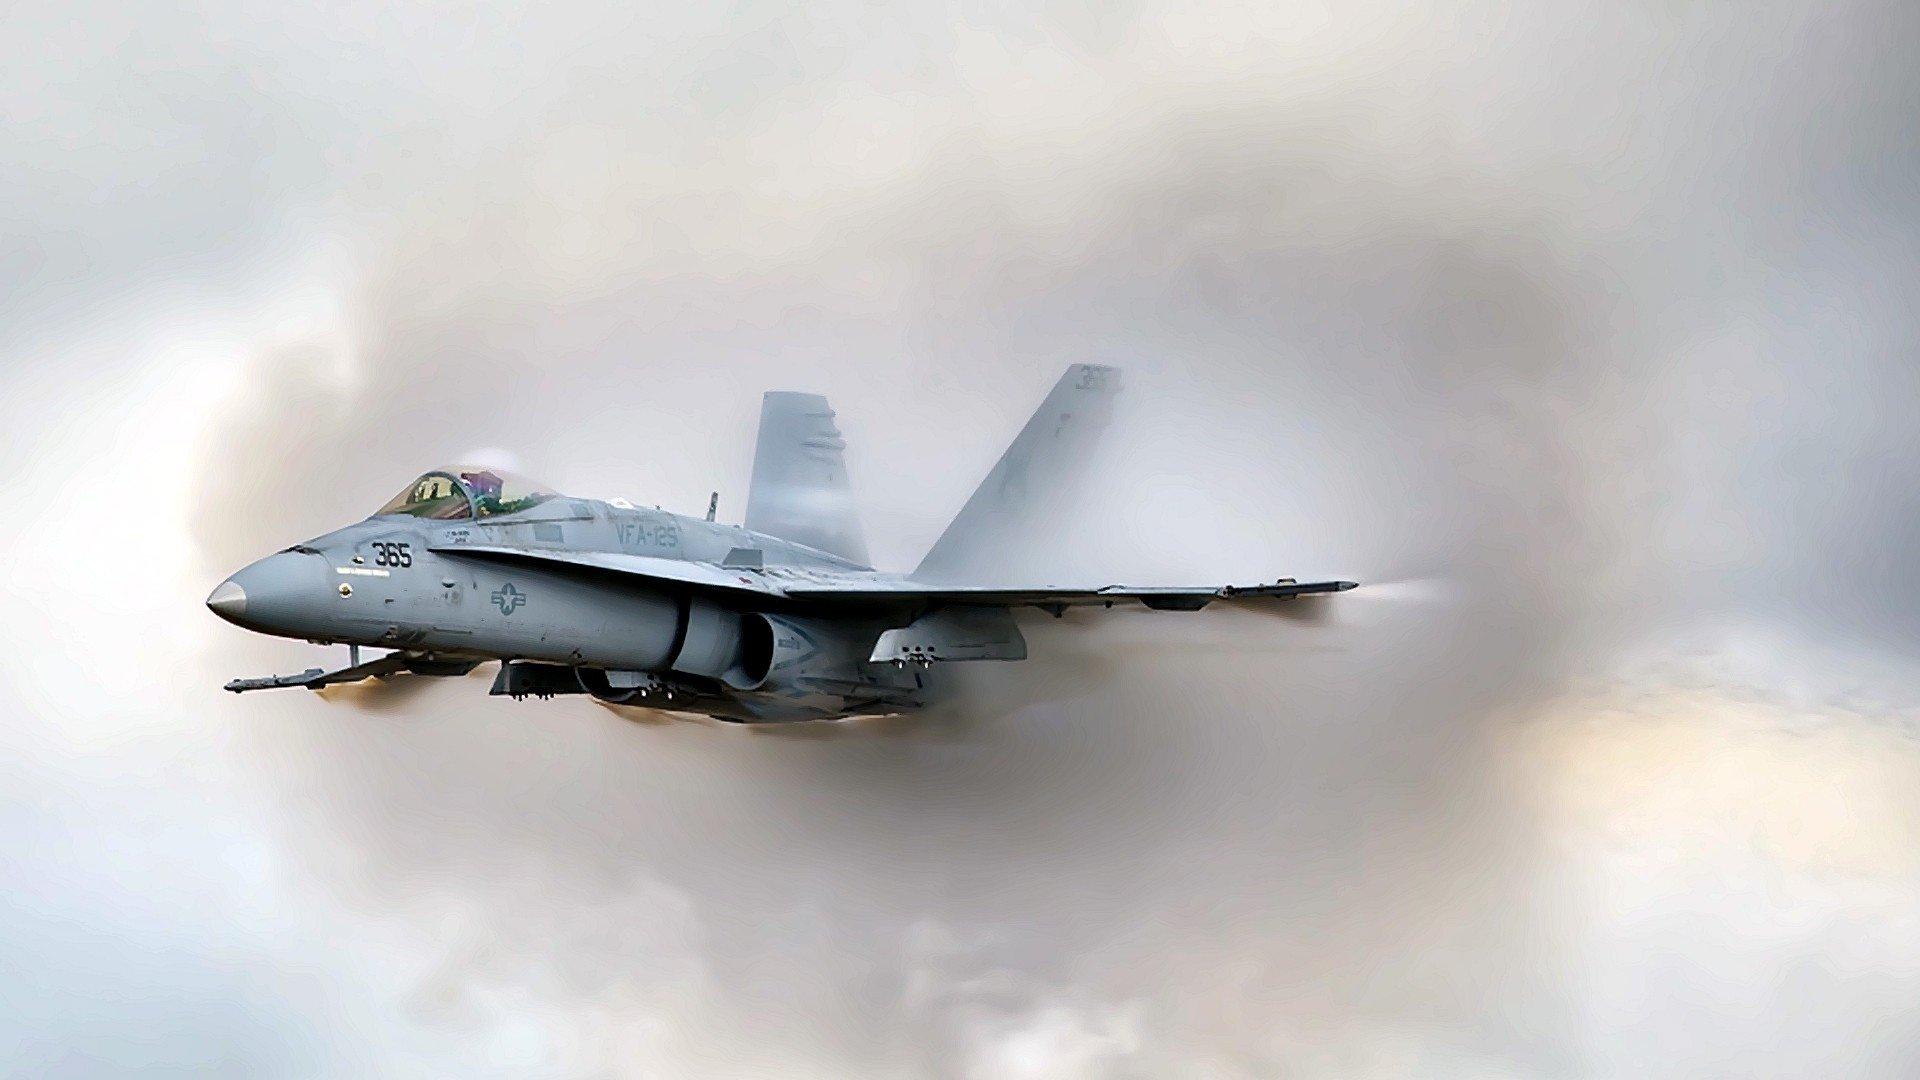 Airplane Full Hd Wallpaper Mcdonnell Douglas F A 18 Hornet Full Hd Wallpaper And